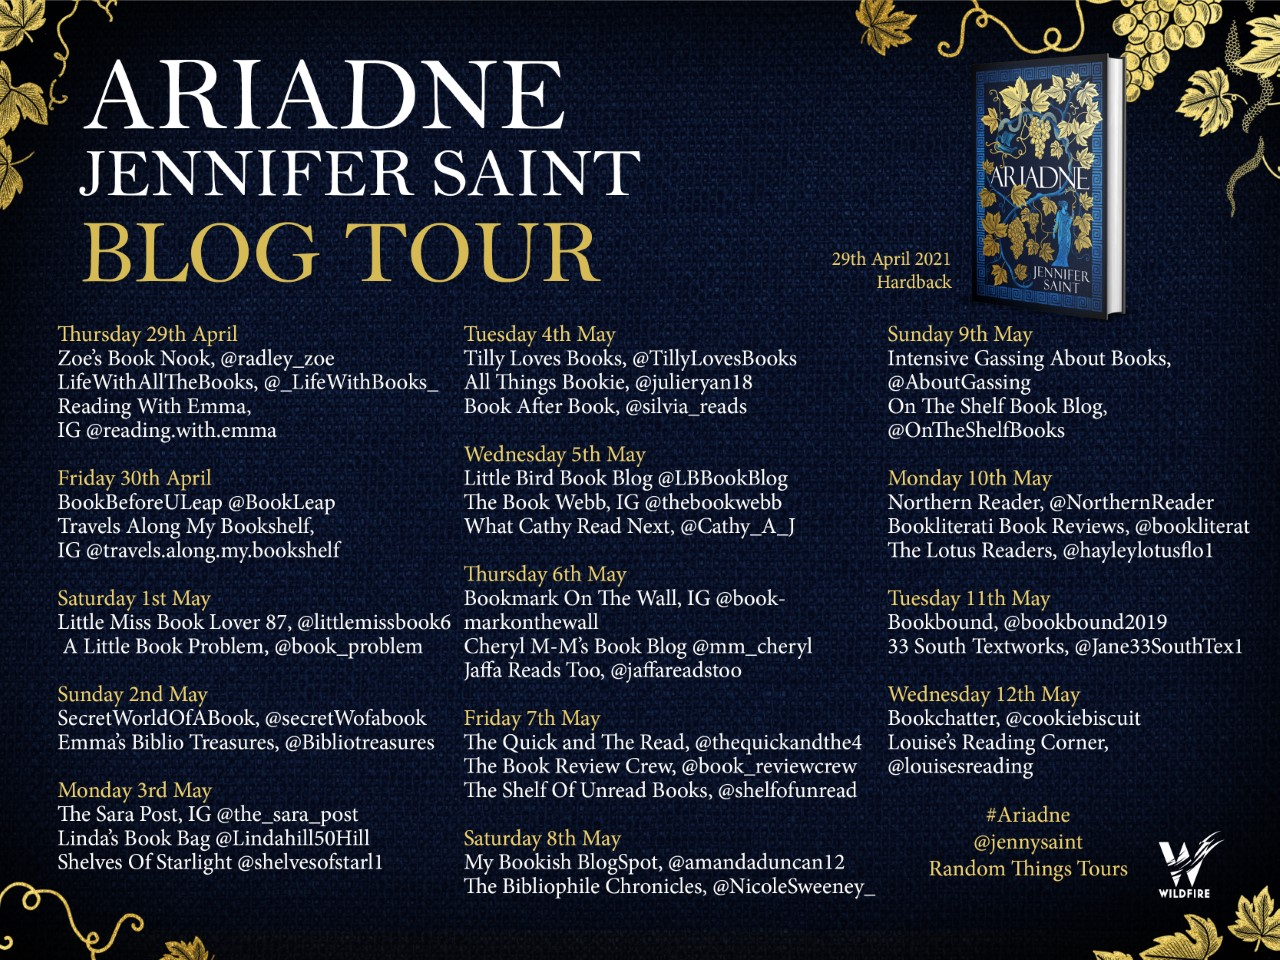 Blog Tour stops for Ariadne